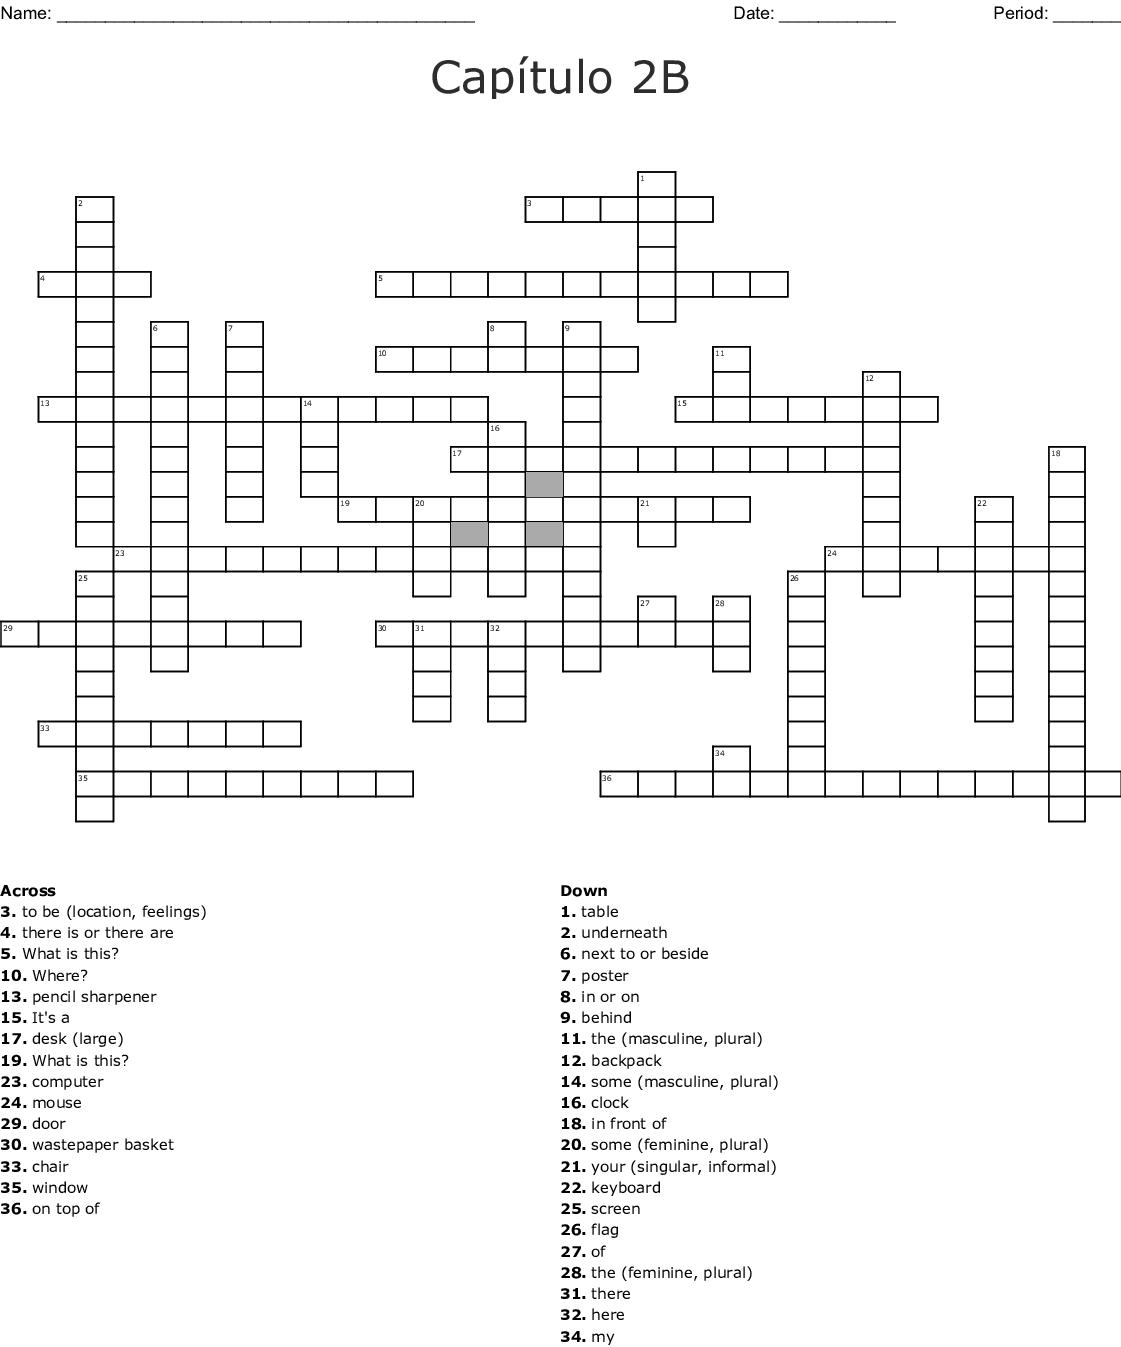 Crossword Answers Repaso Del Capitulo Crucigrama